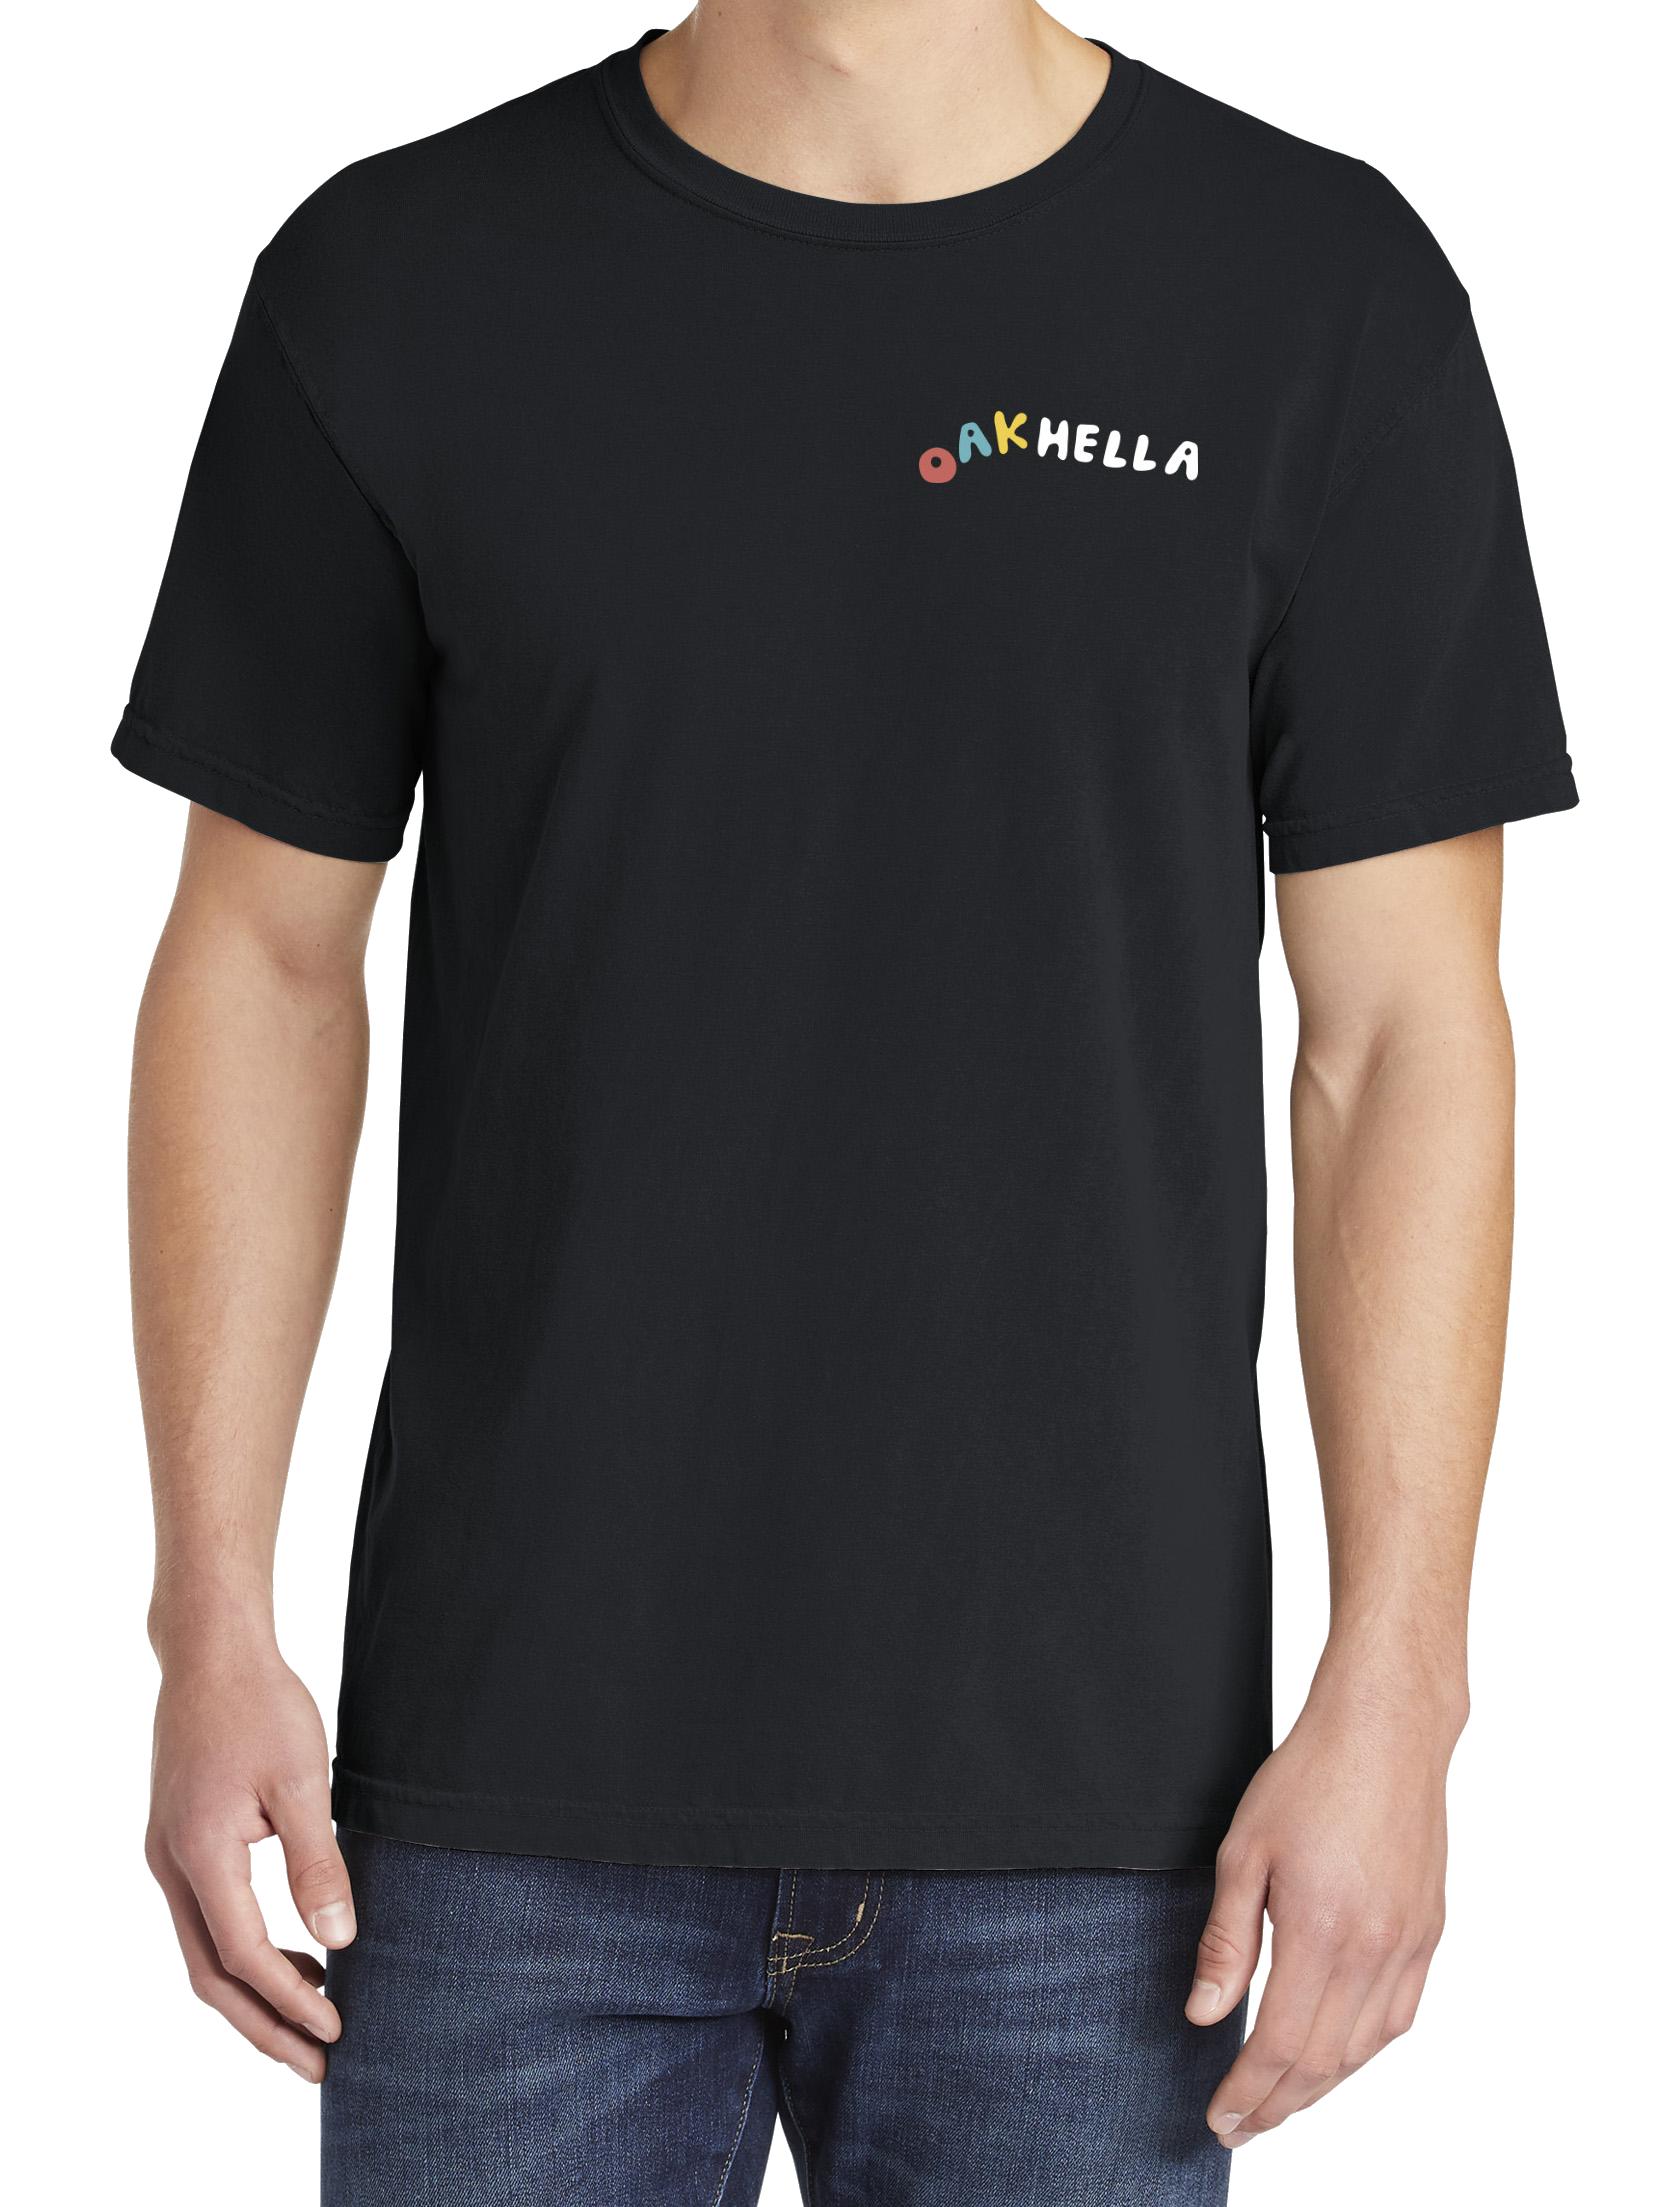 Oakhella shirt Front.png